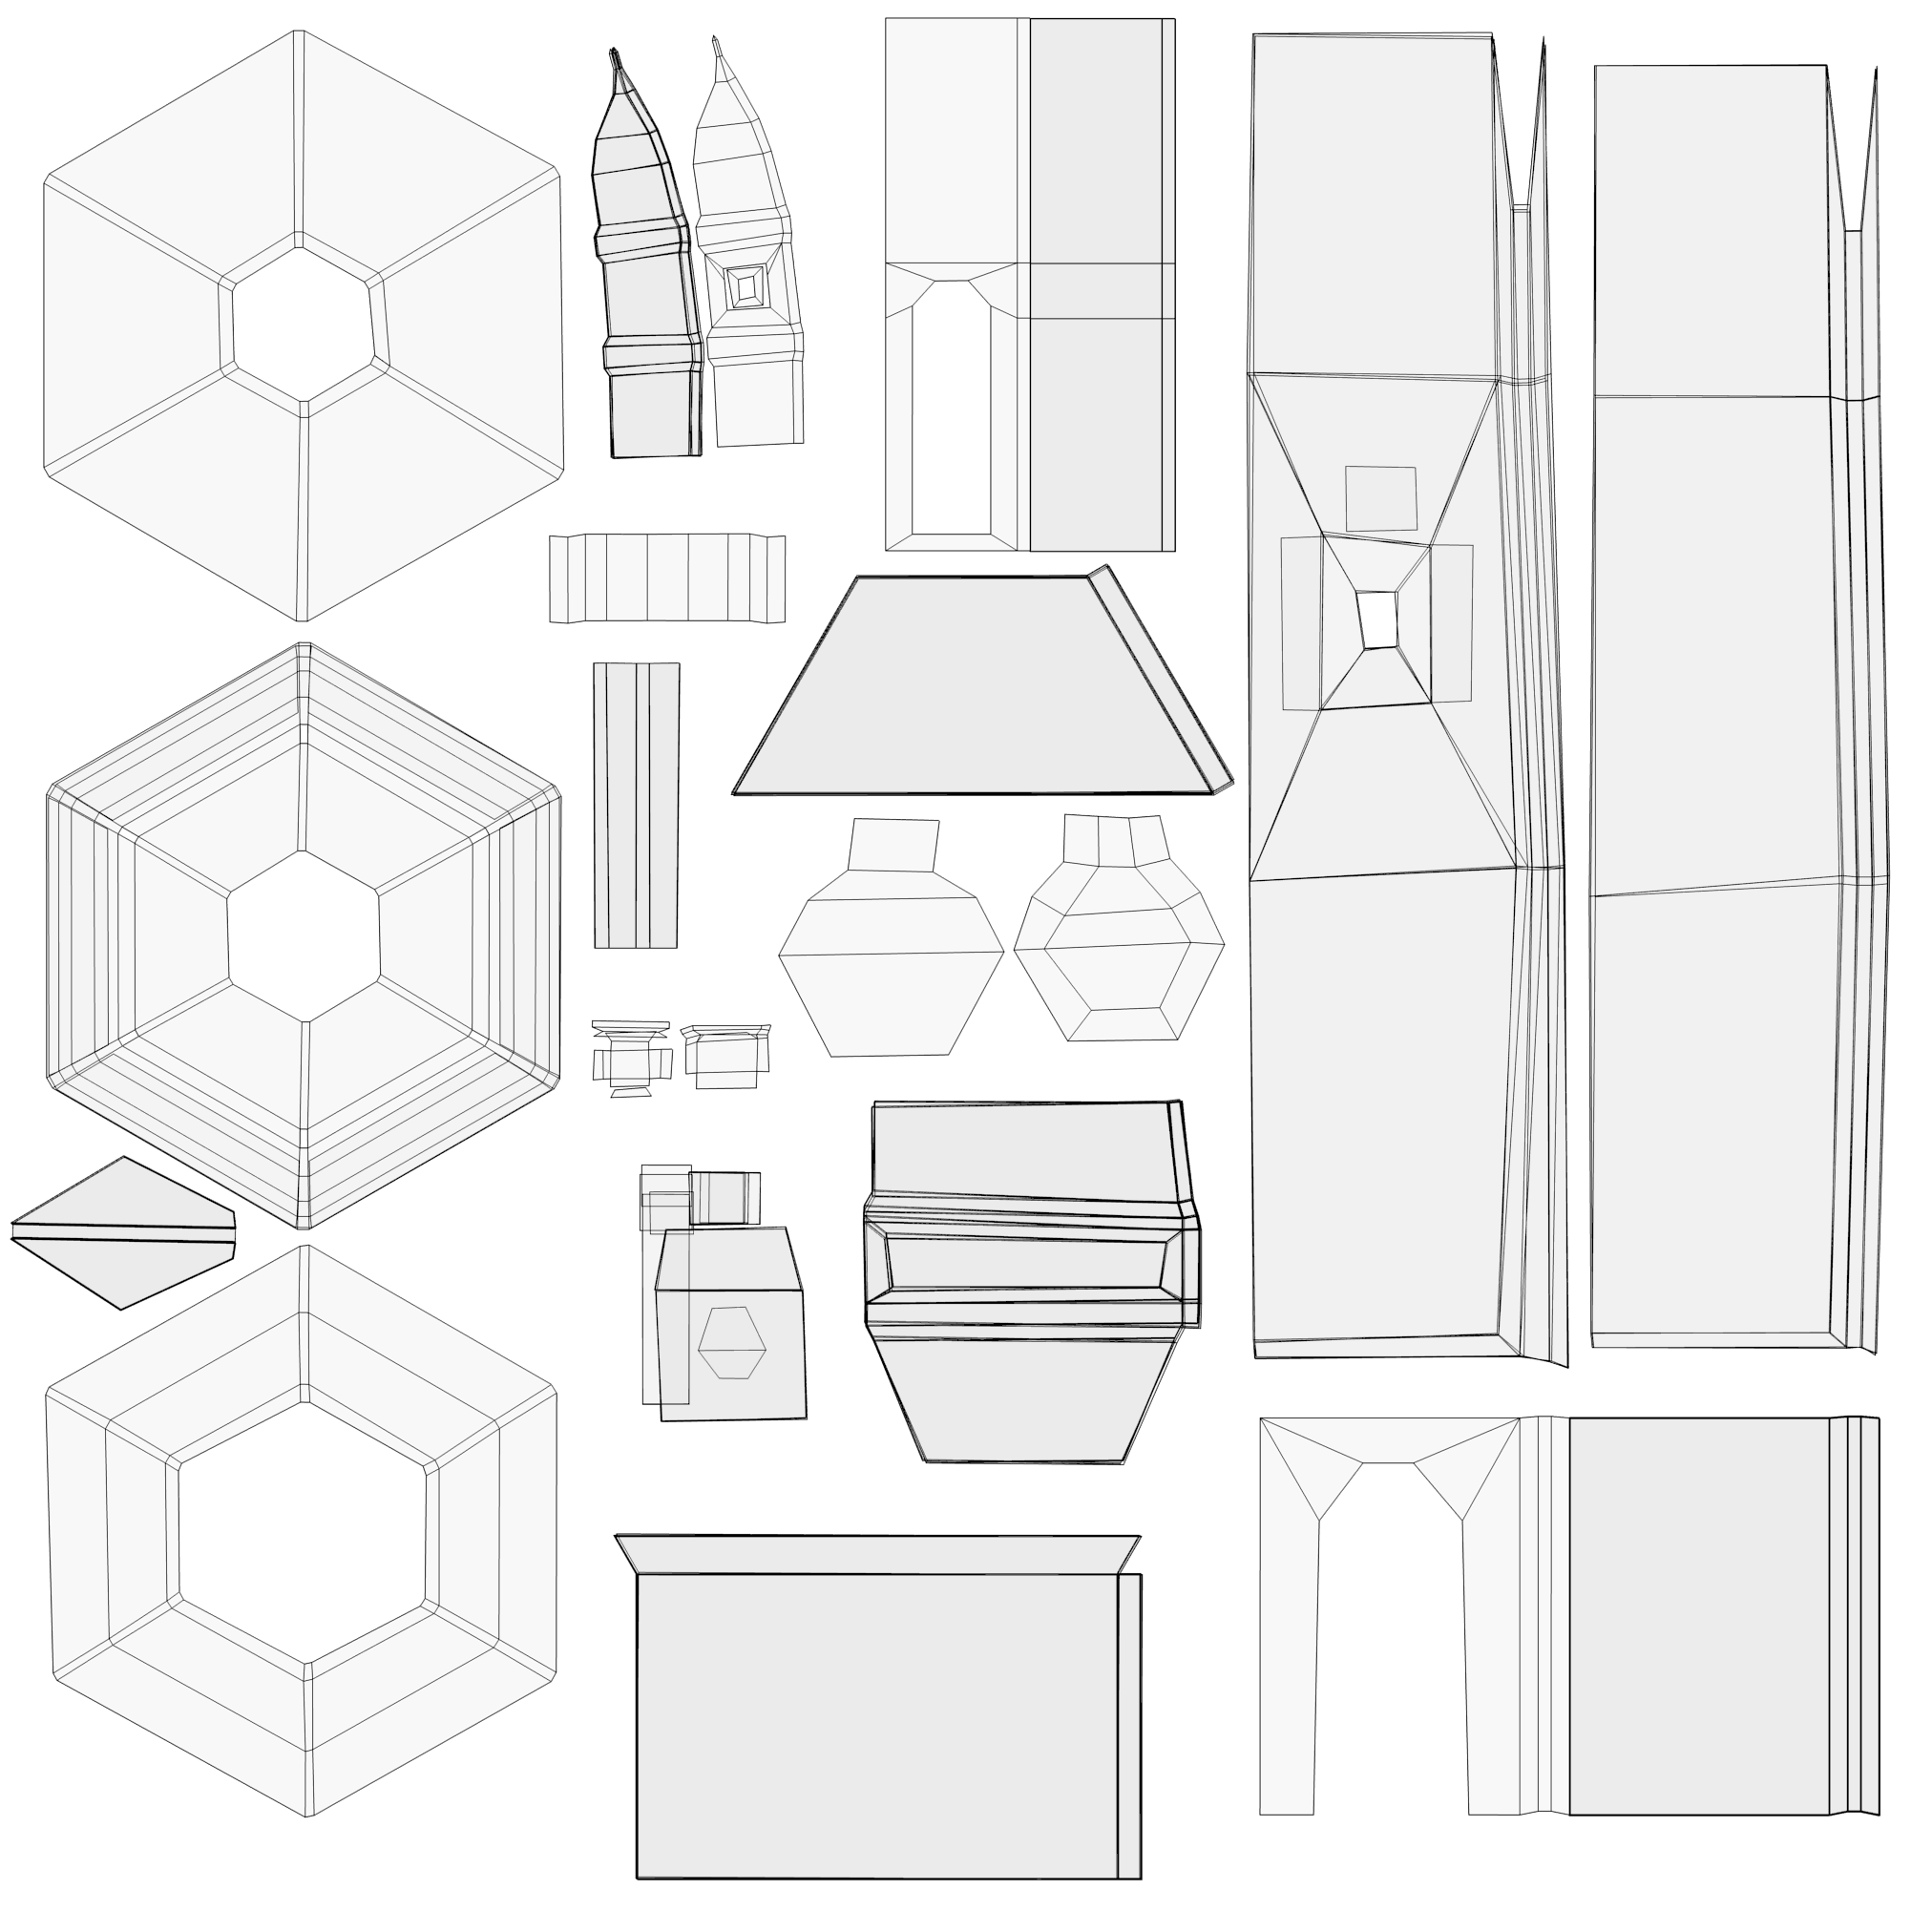 arab moorish minaret low poly building model 3D Model